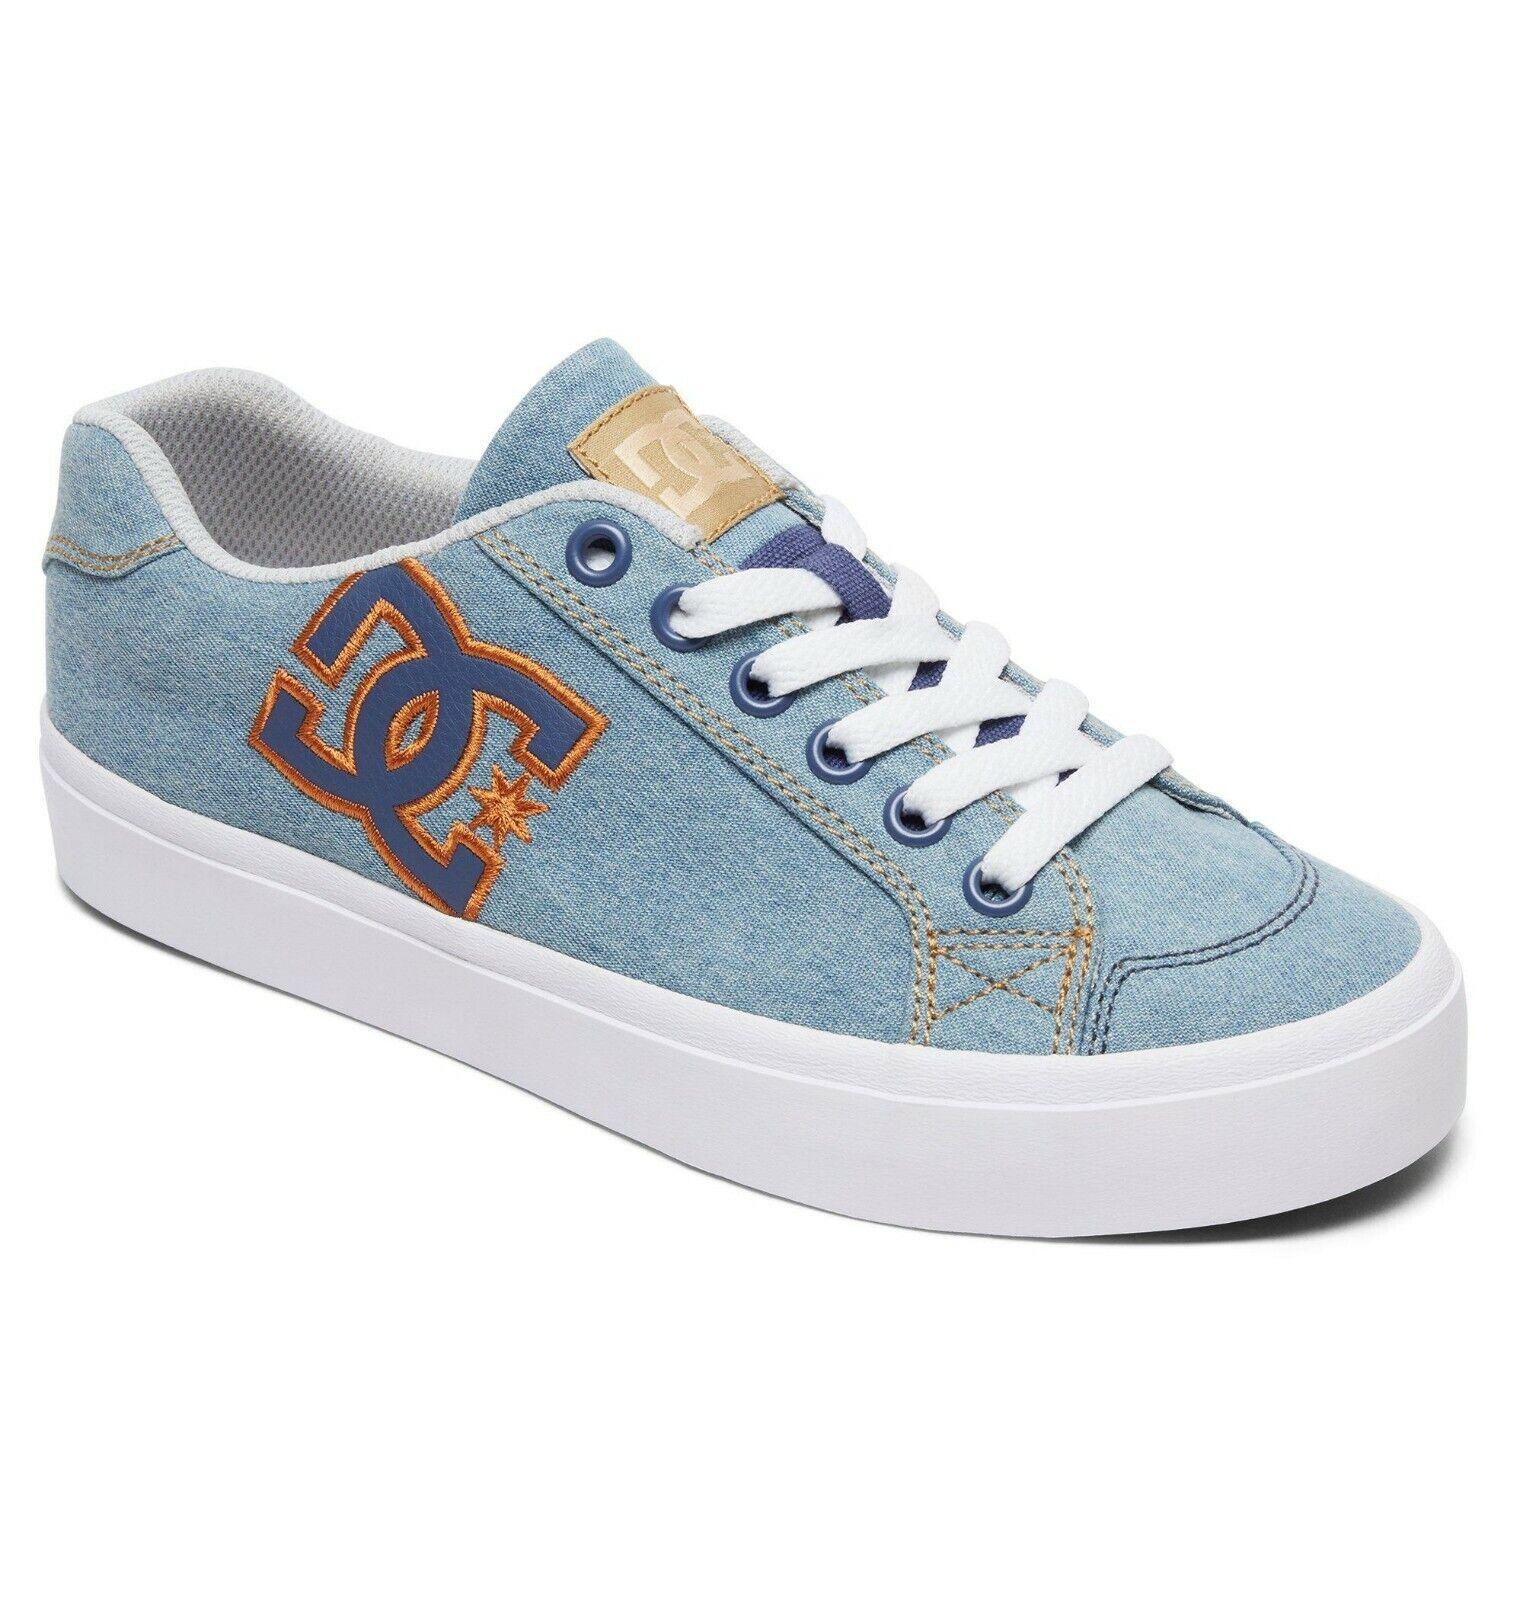 Dc zapatos Chelsea Plus Tx Se Denim ADJS300232 Dnm para Mujer Tallas 4-8 Rrp